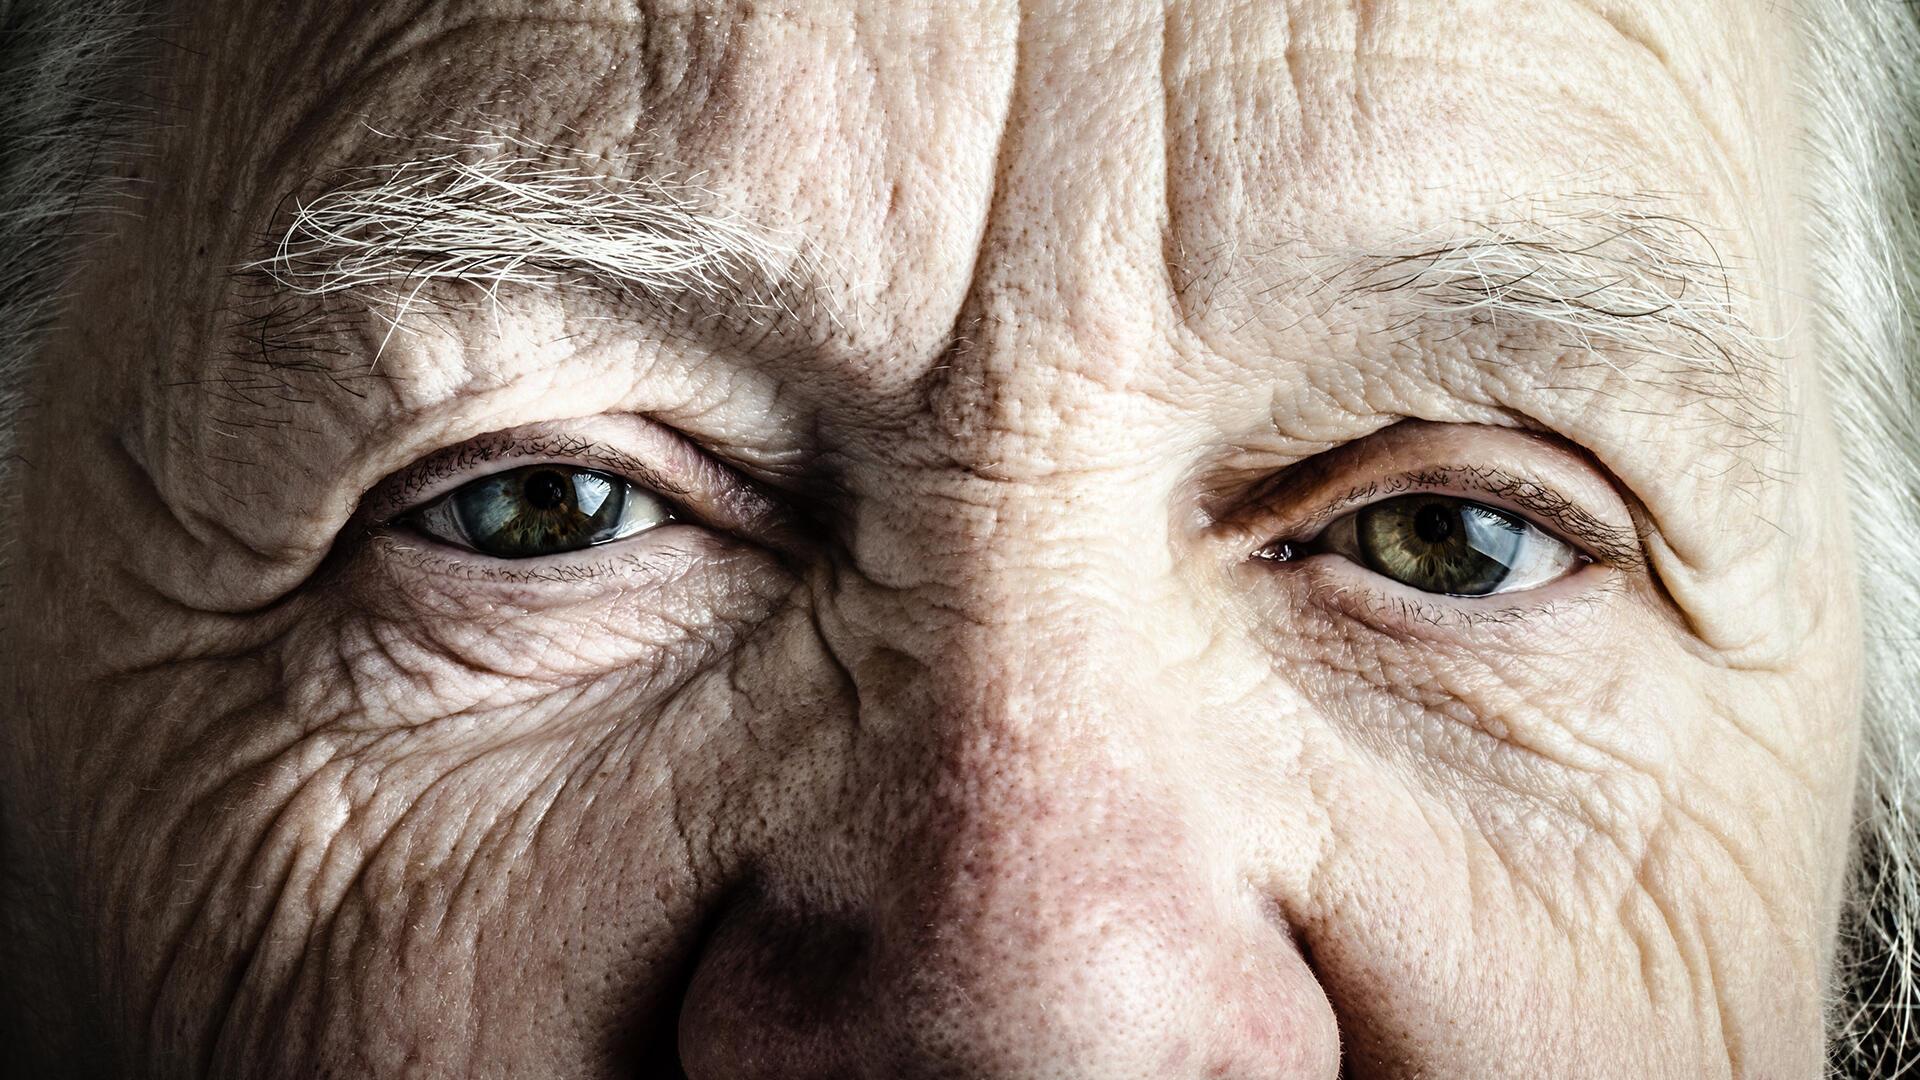 vieille dame vieillesse gros plan yeux âgé